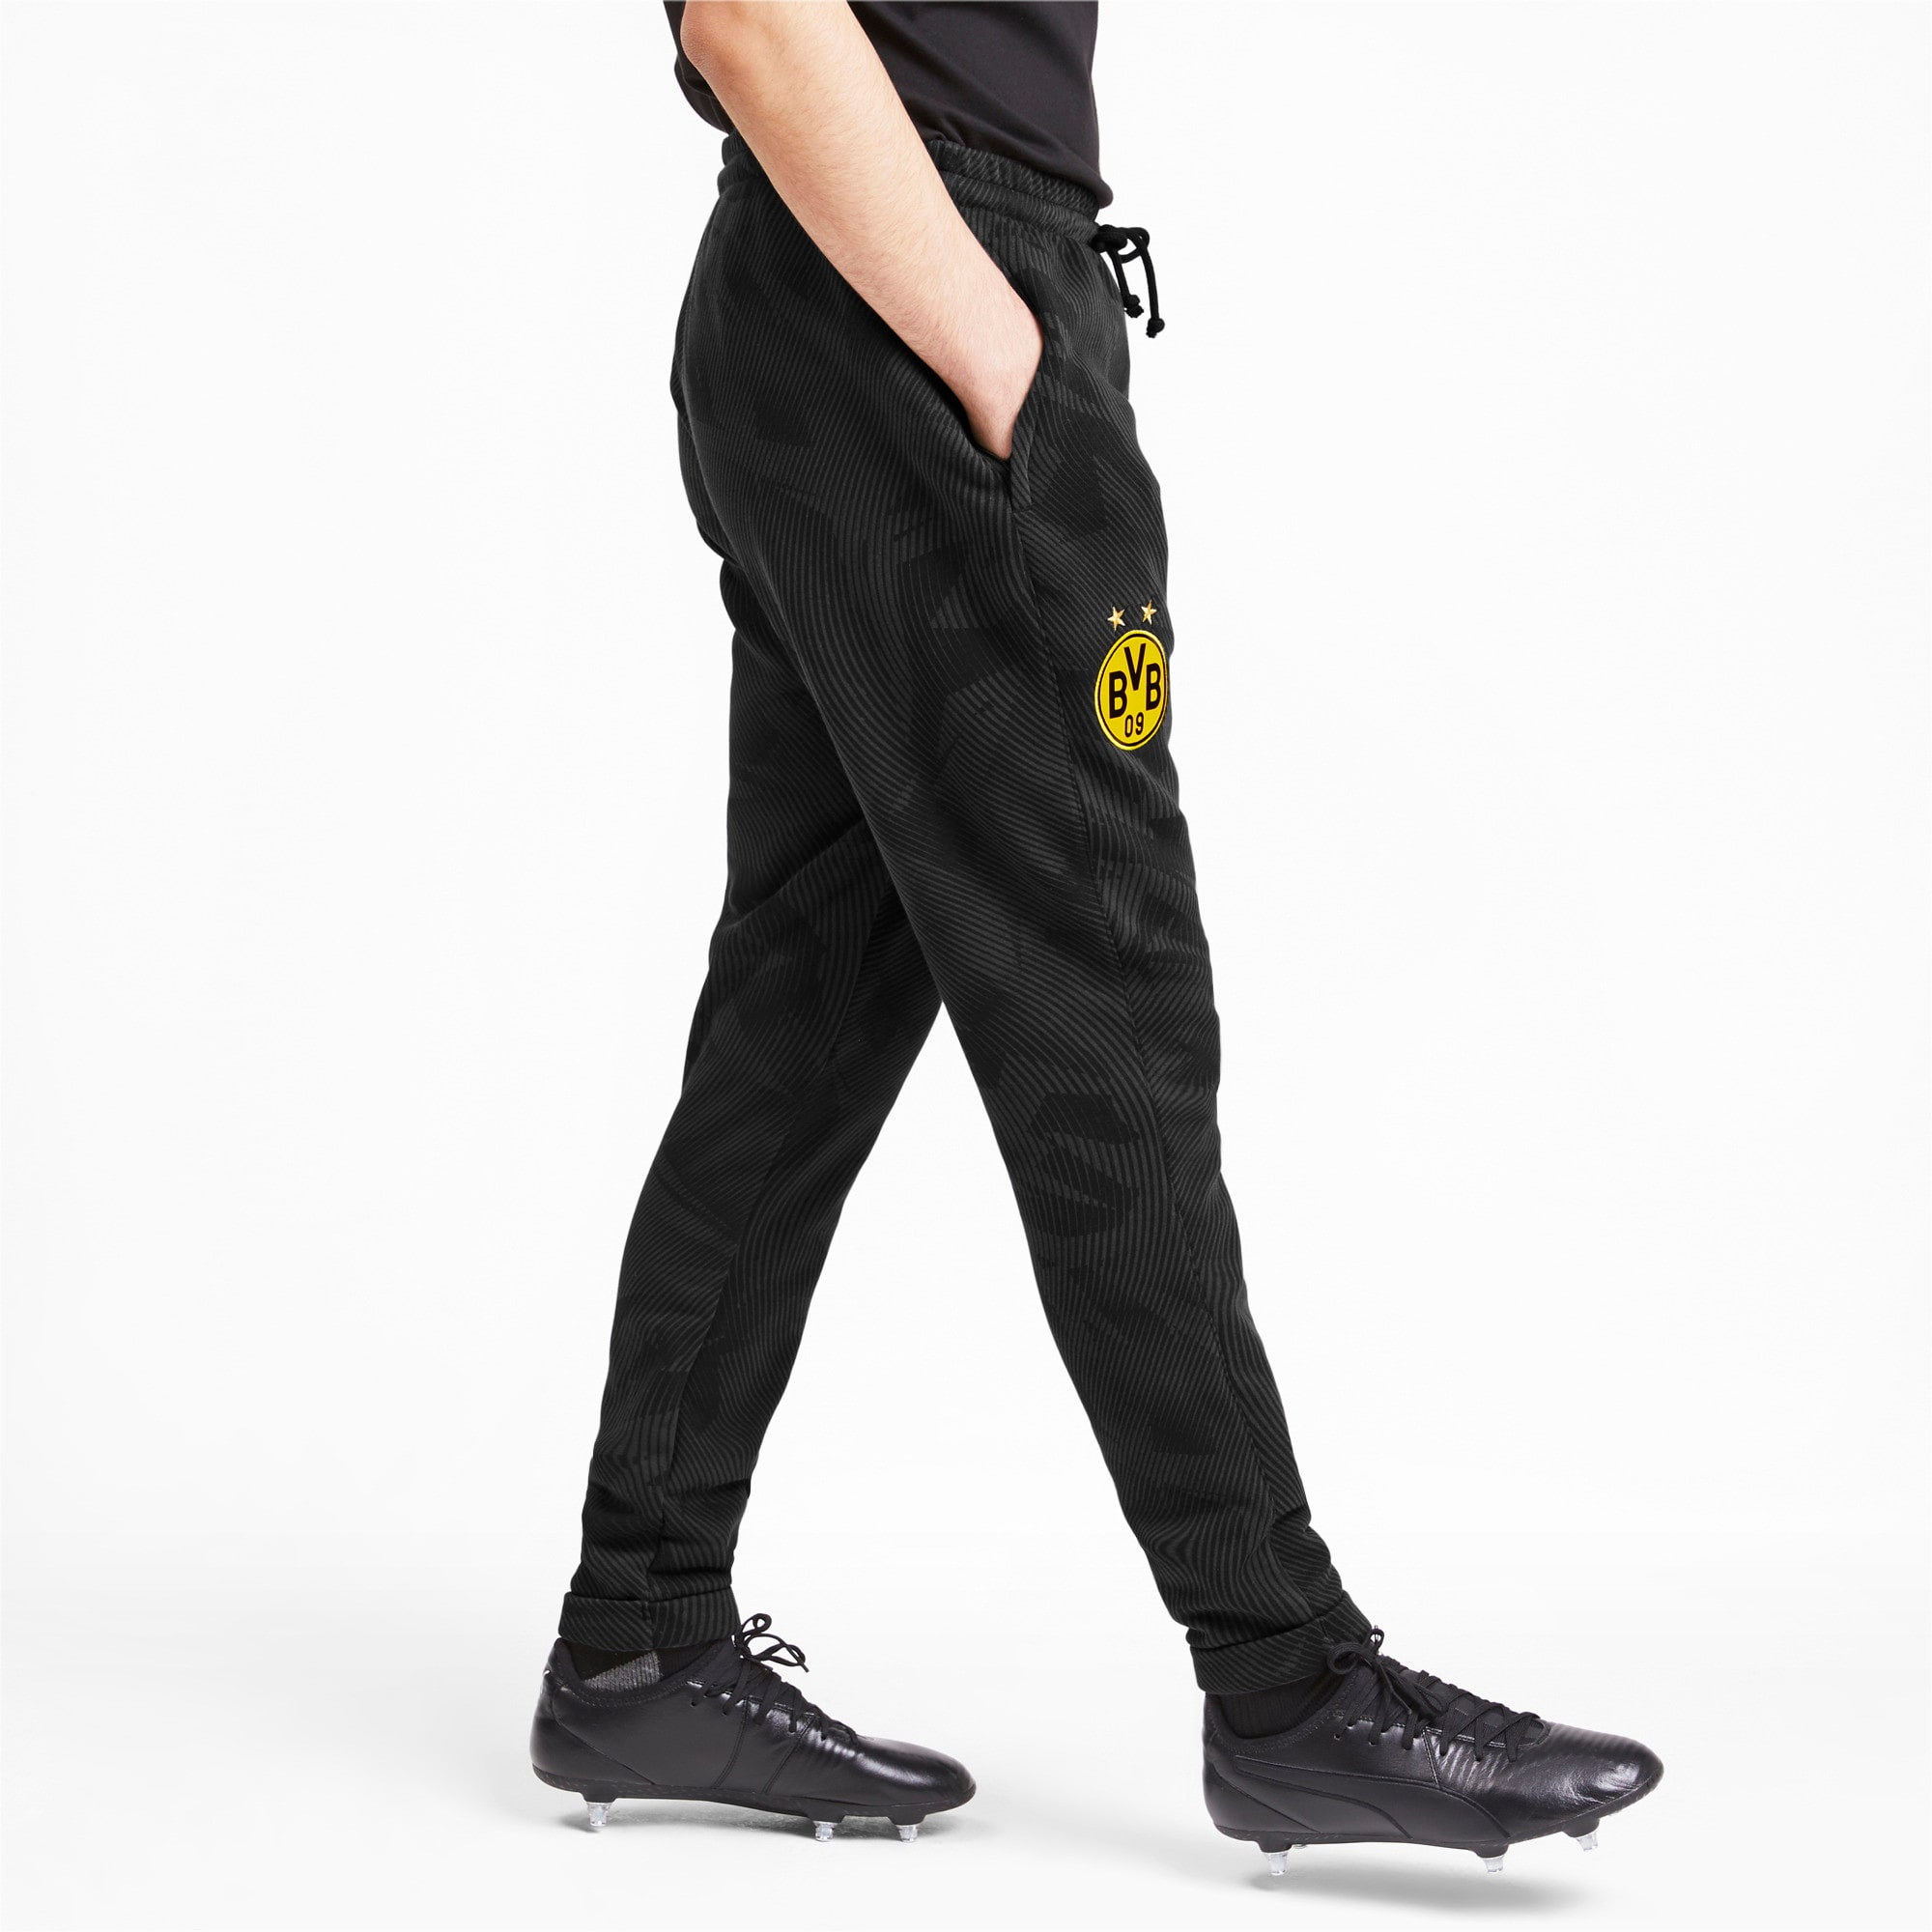 Thumbnail 1 of BVB Men's Casual Pants, Puma Black-Phantom Black, medium